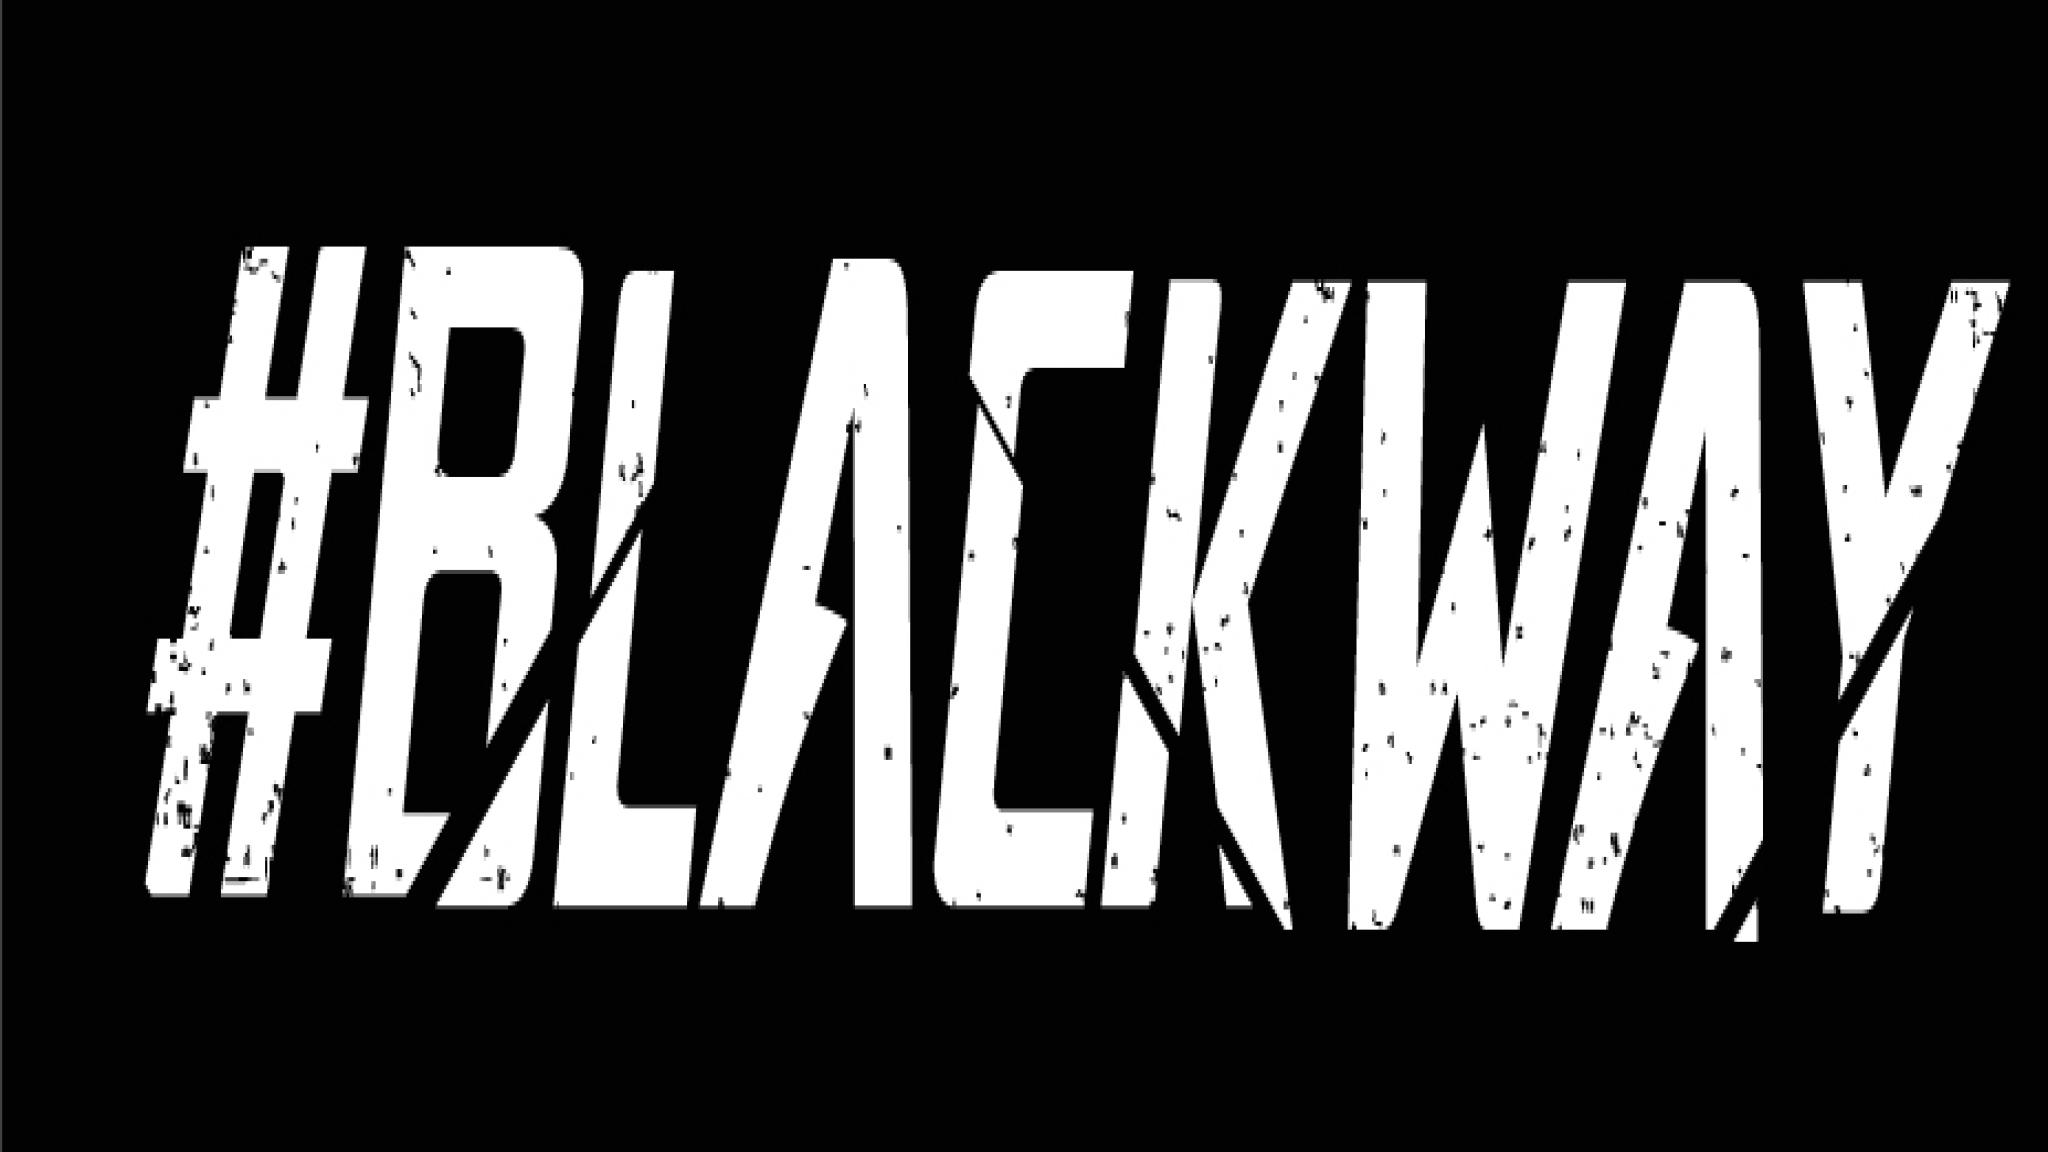 resizeblackway